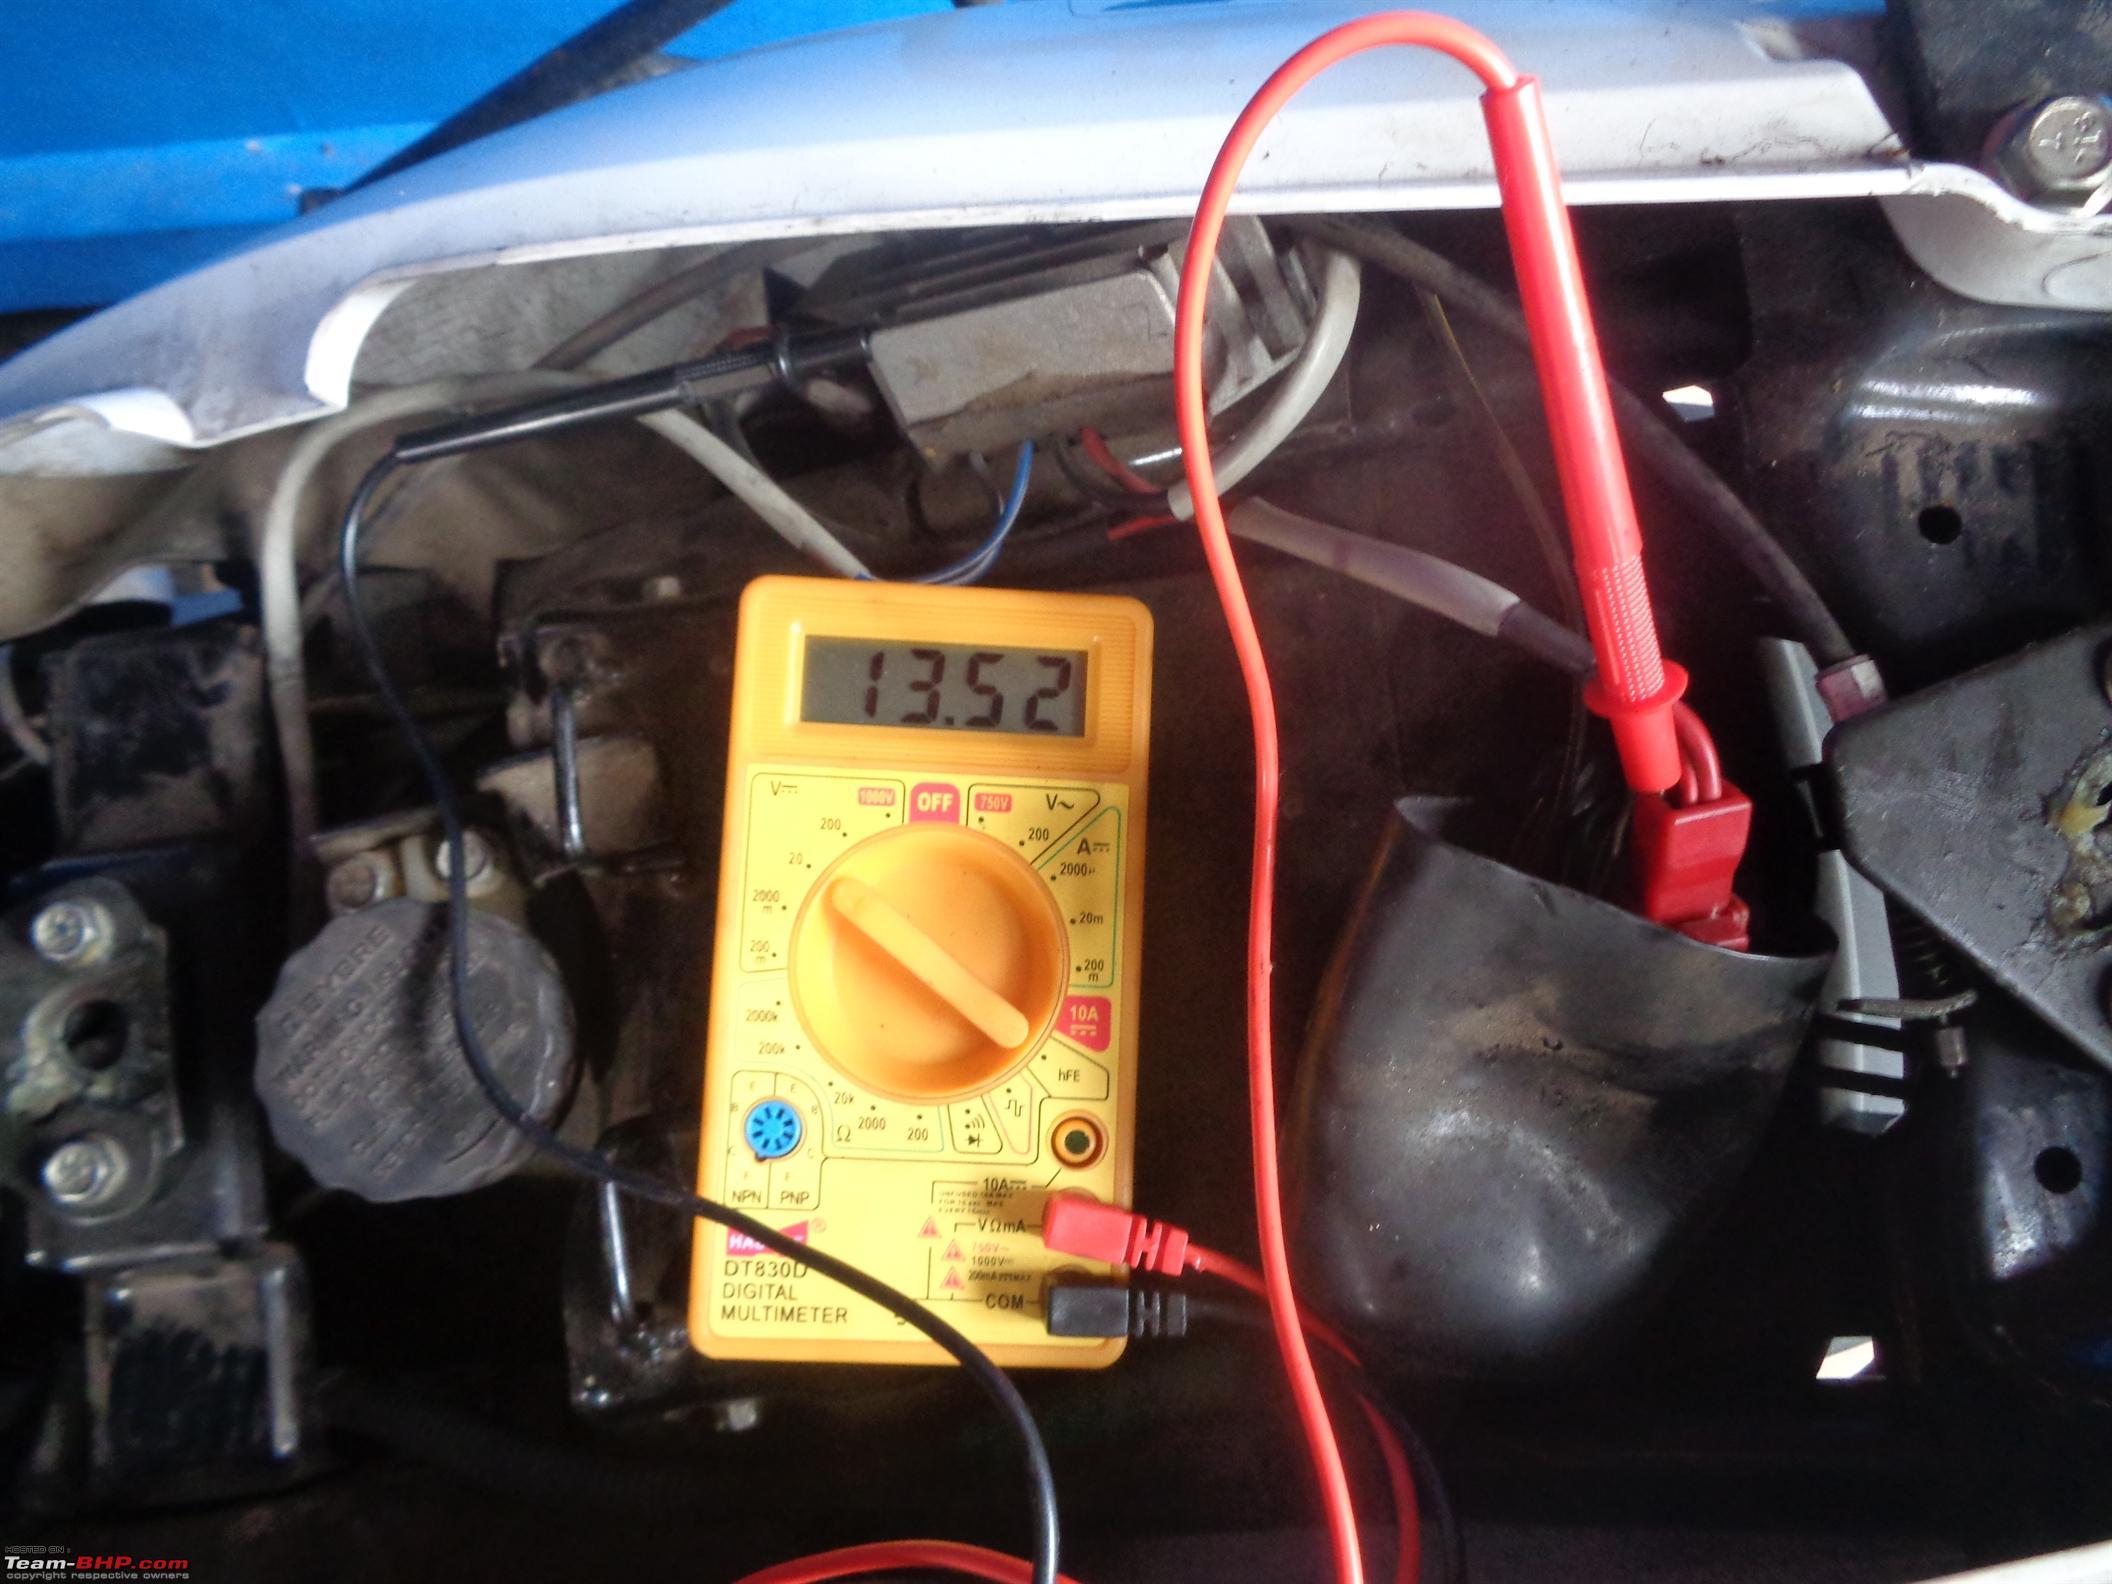 Understanding Troubleshooting Motorcycle Charging Systems Team Bhp Voltmeter Wiring Diagram System In Dsc00327